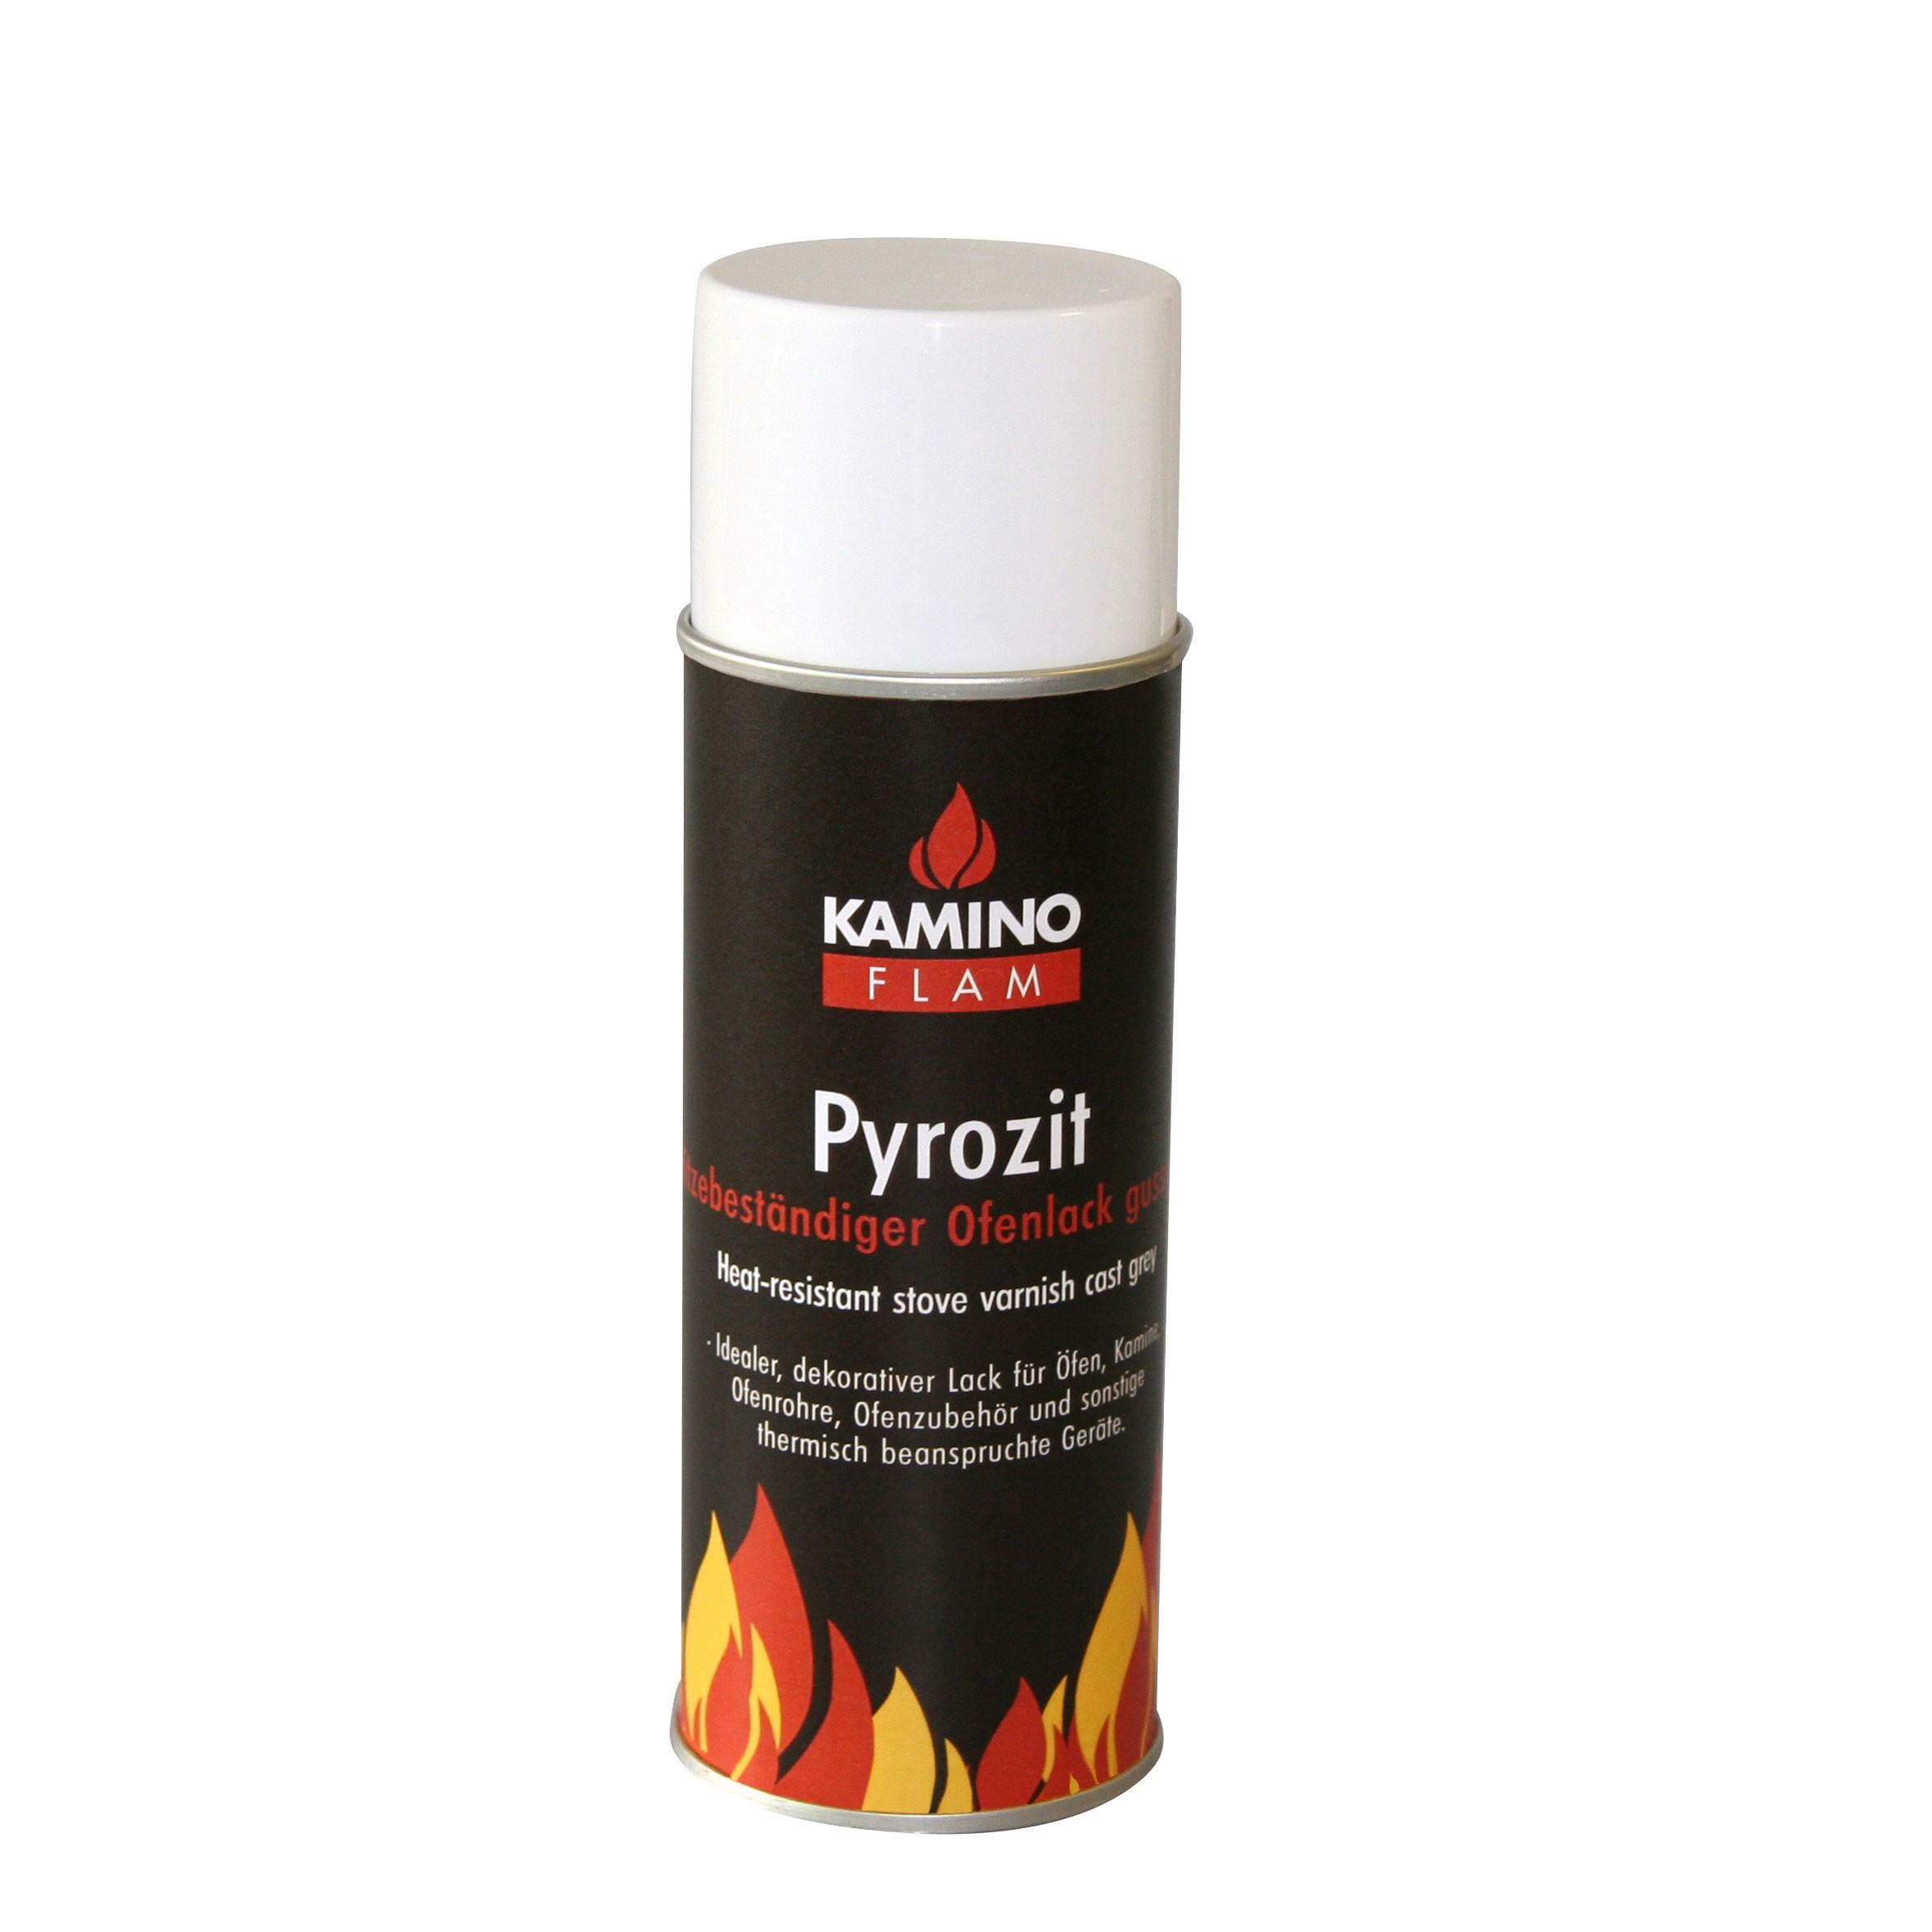 Ofenlack Spray KaminoFlam Pyrozit gussgrau 300ml Bild 1